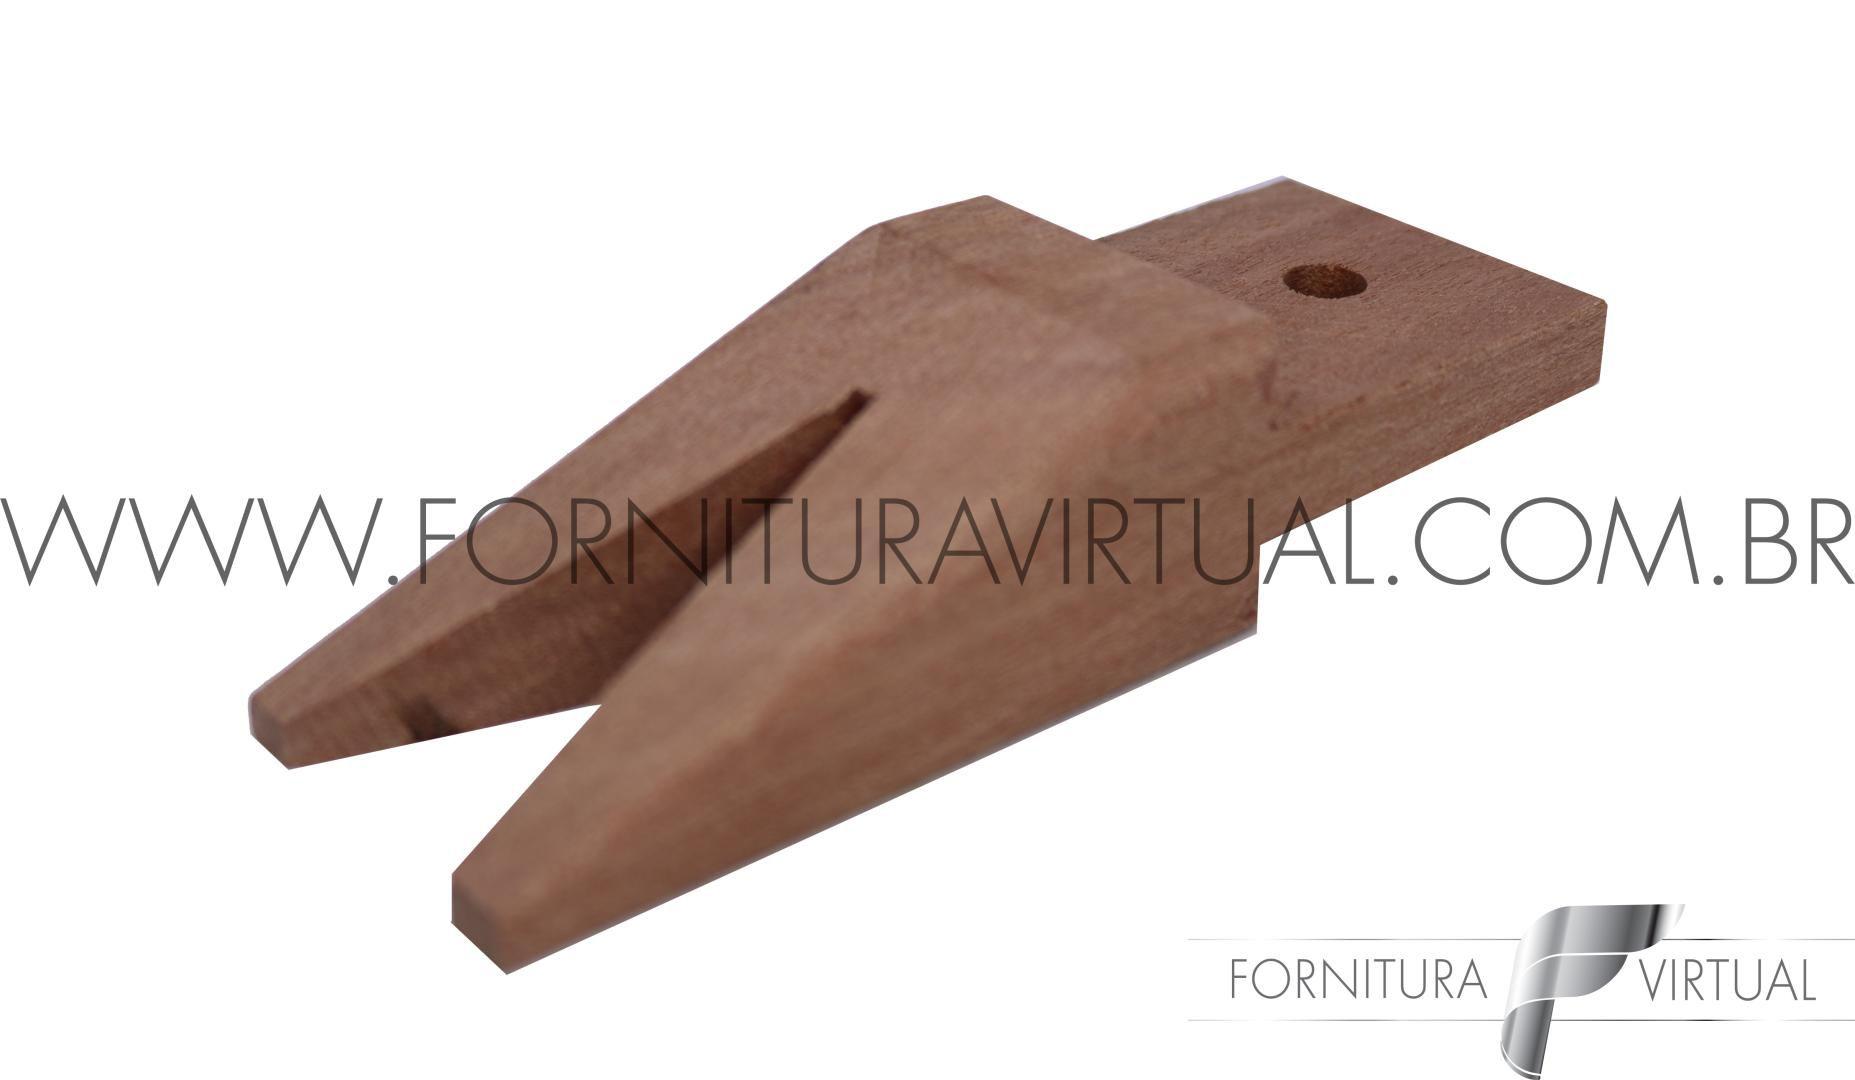 Estilheira de madeira Avulsa - Furada